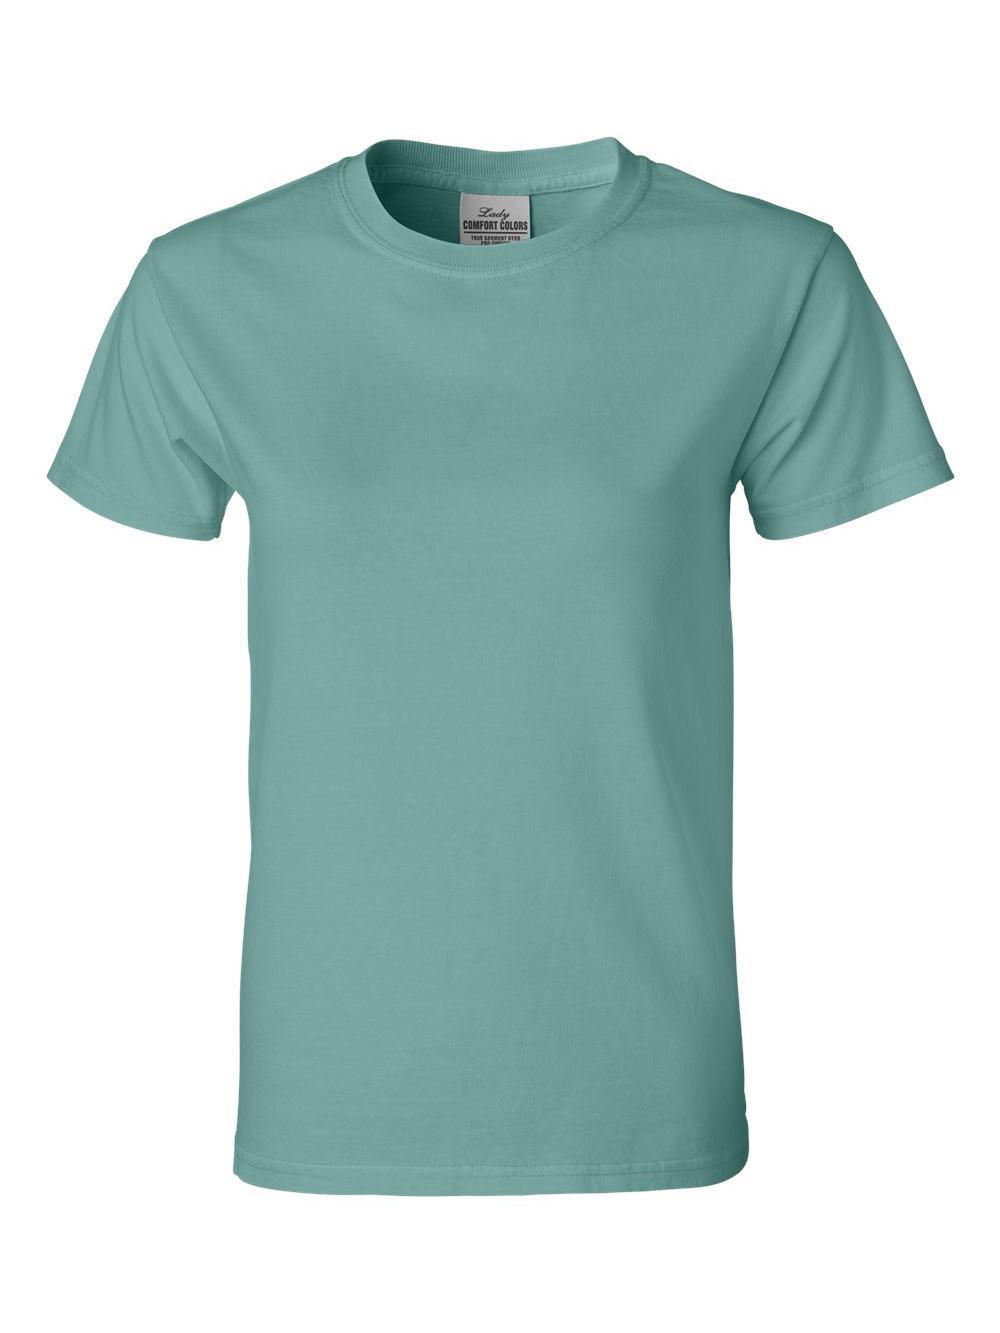 Comfort-Colors-Pigment-Dyed-Ringspun-Women-039-s-Short-Sleeve-T-Shirt-3333 thumbnail 25